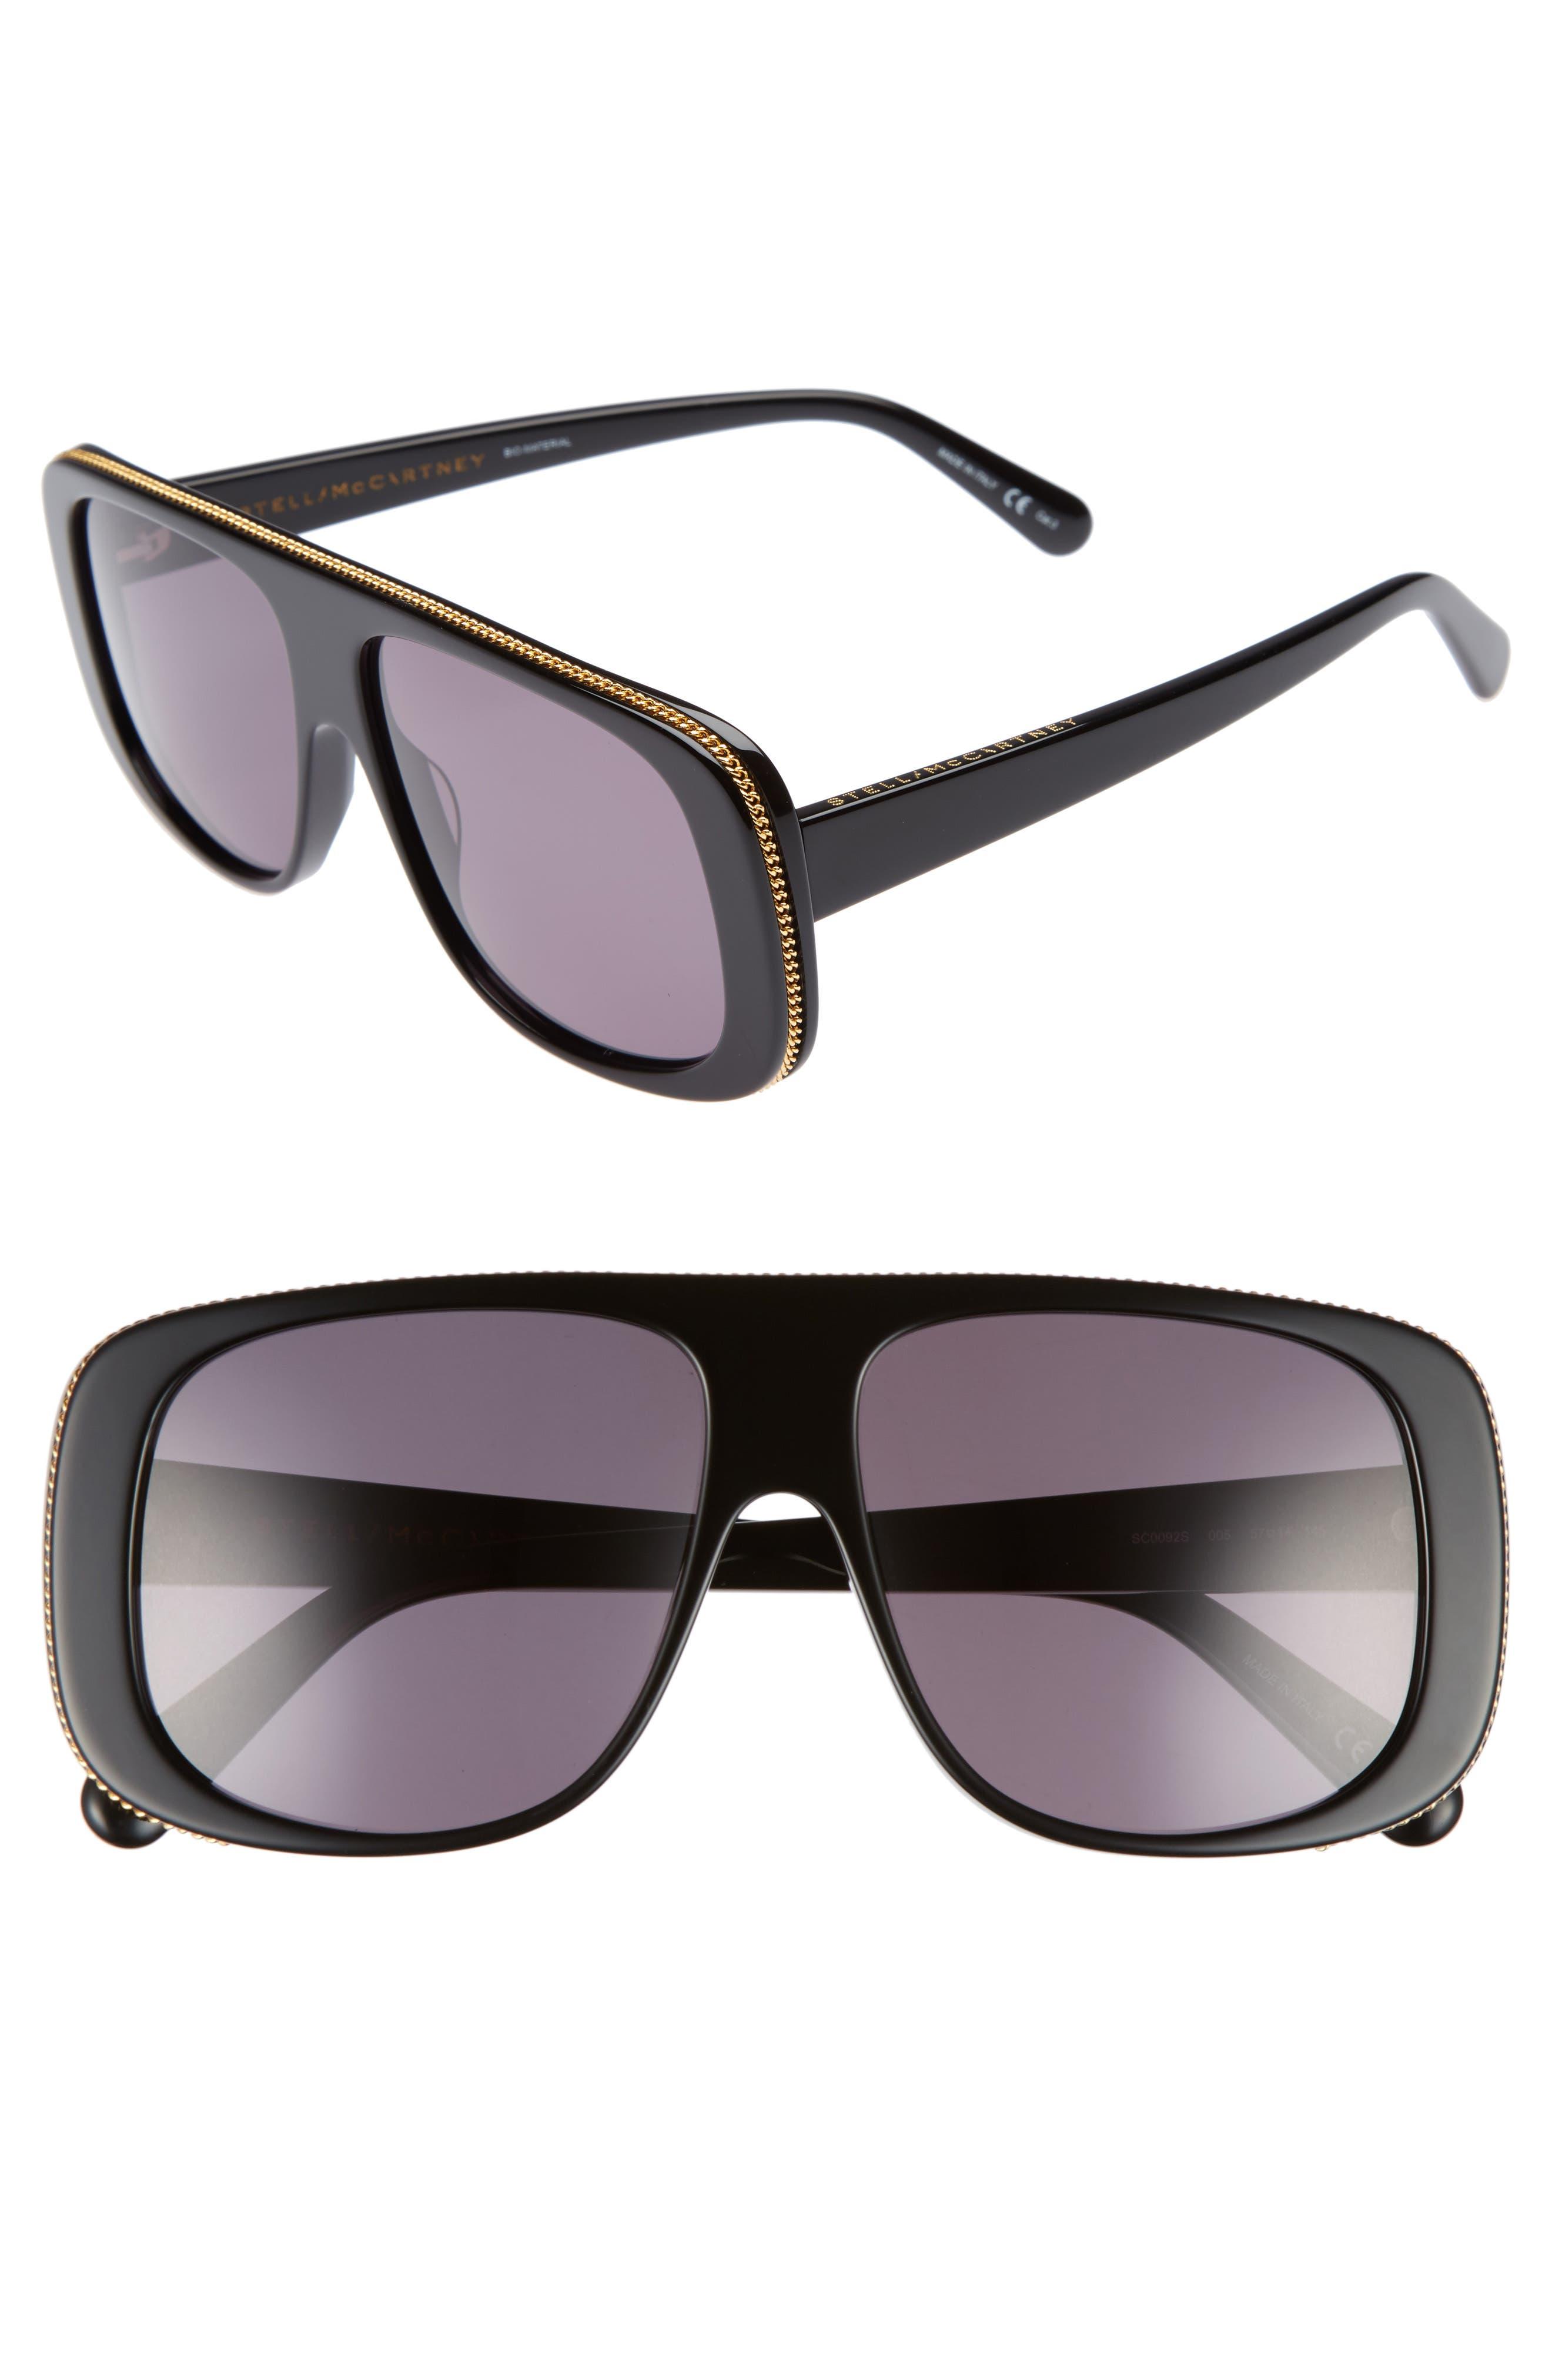 57mm Flat Top Sunglasses,                             Main thumbnail 1, color,                             BLACK/ GREY